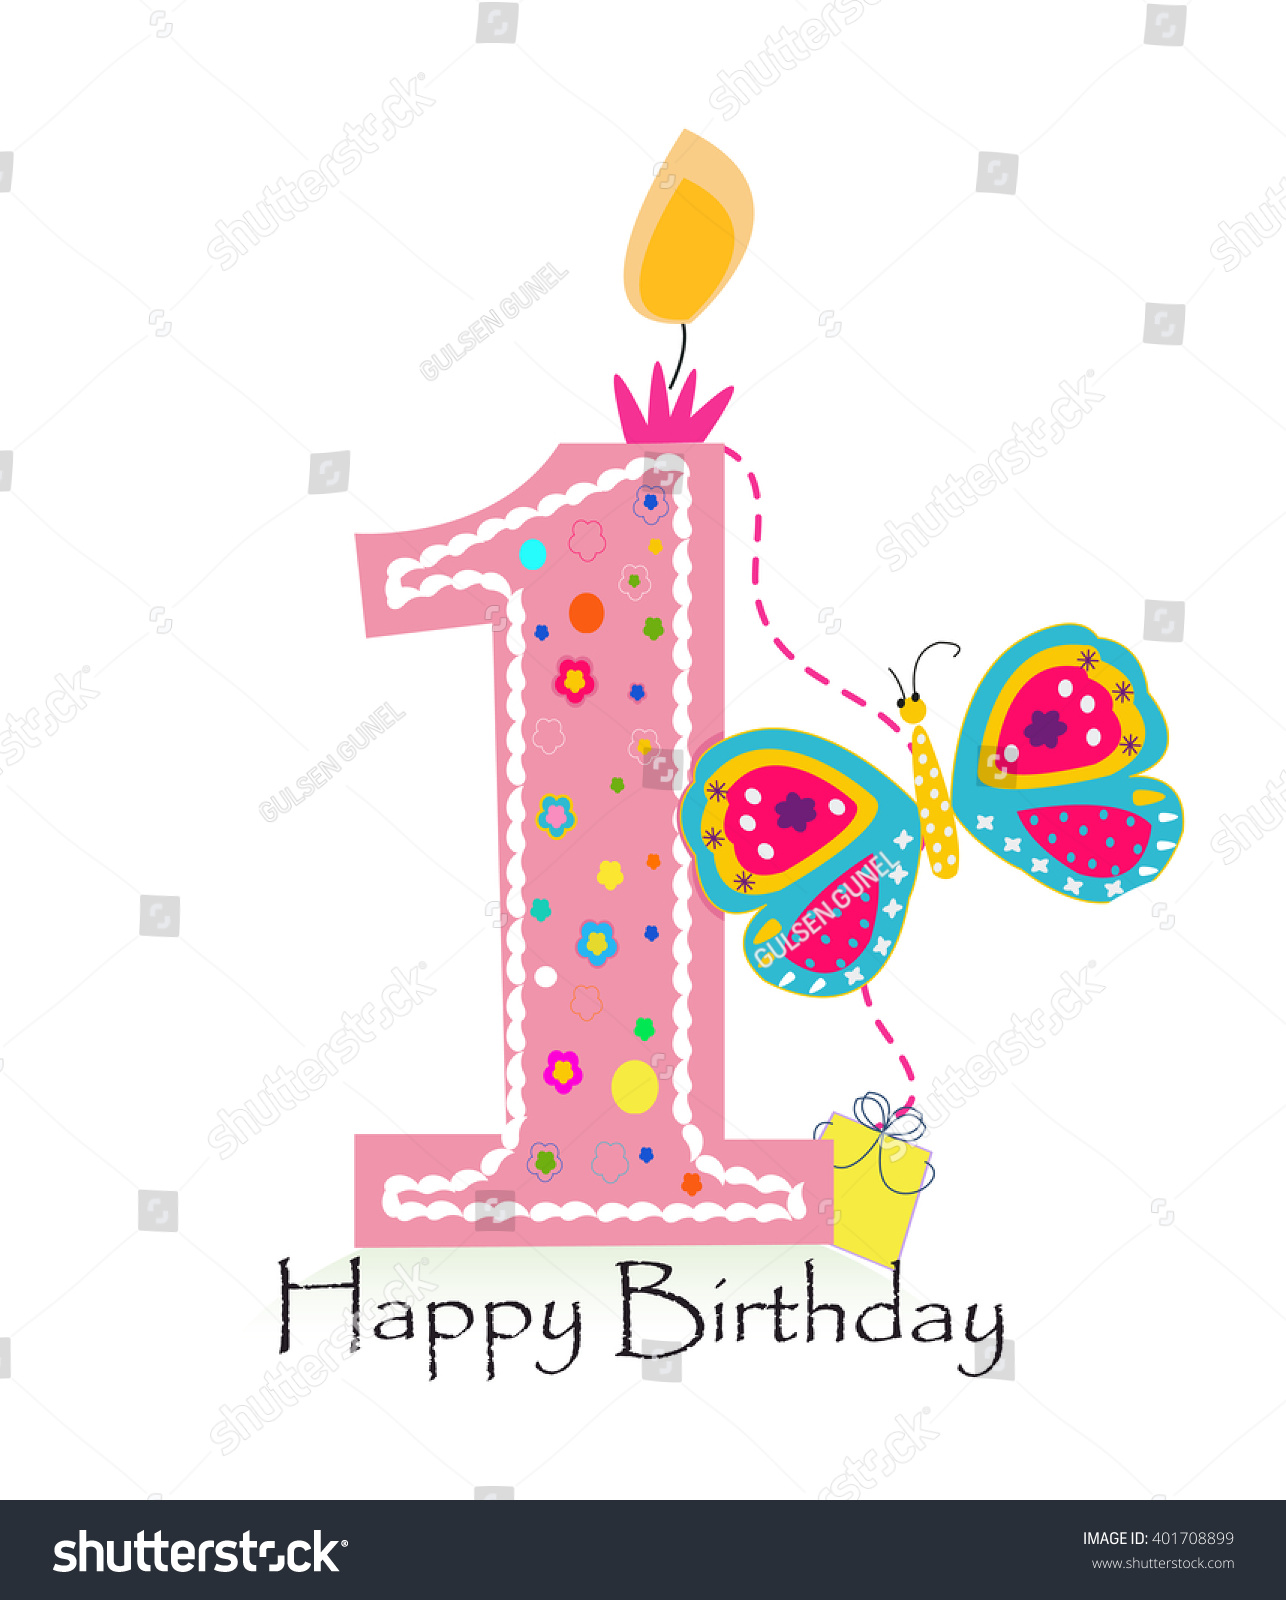 Butterfly Birthday Invitations Free as nice invitation ideas